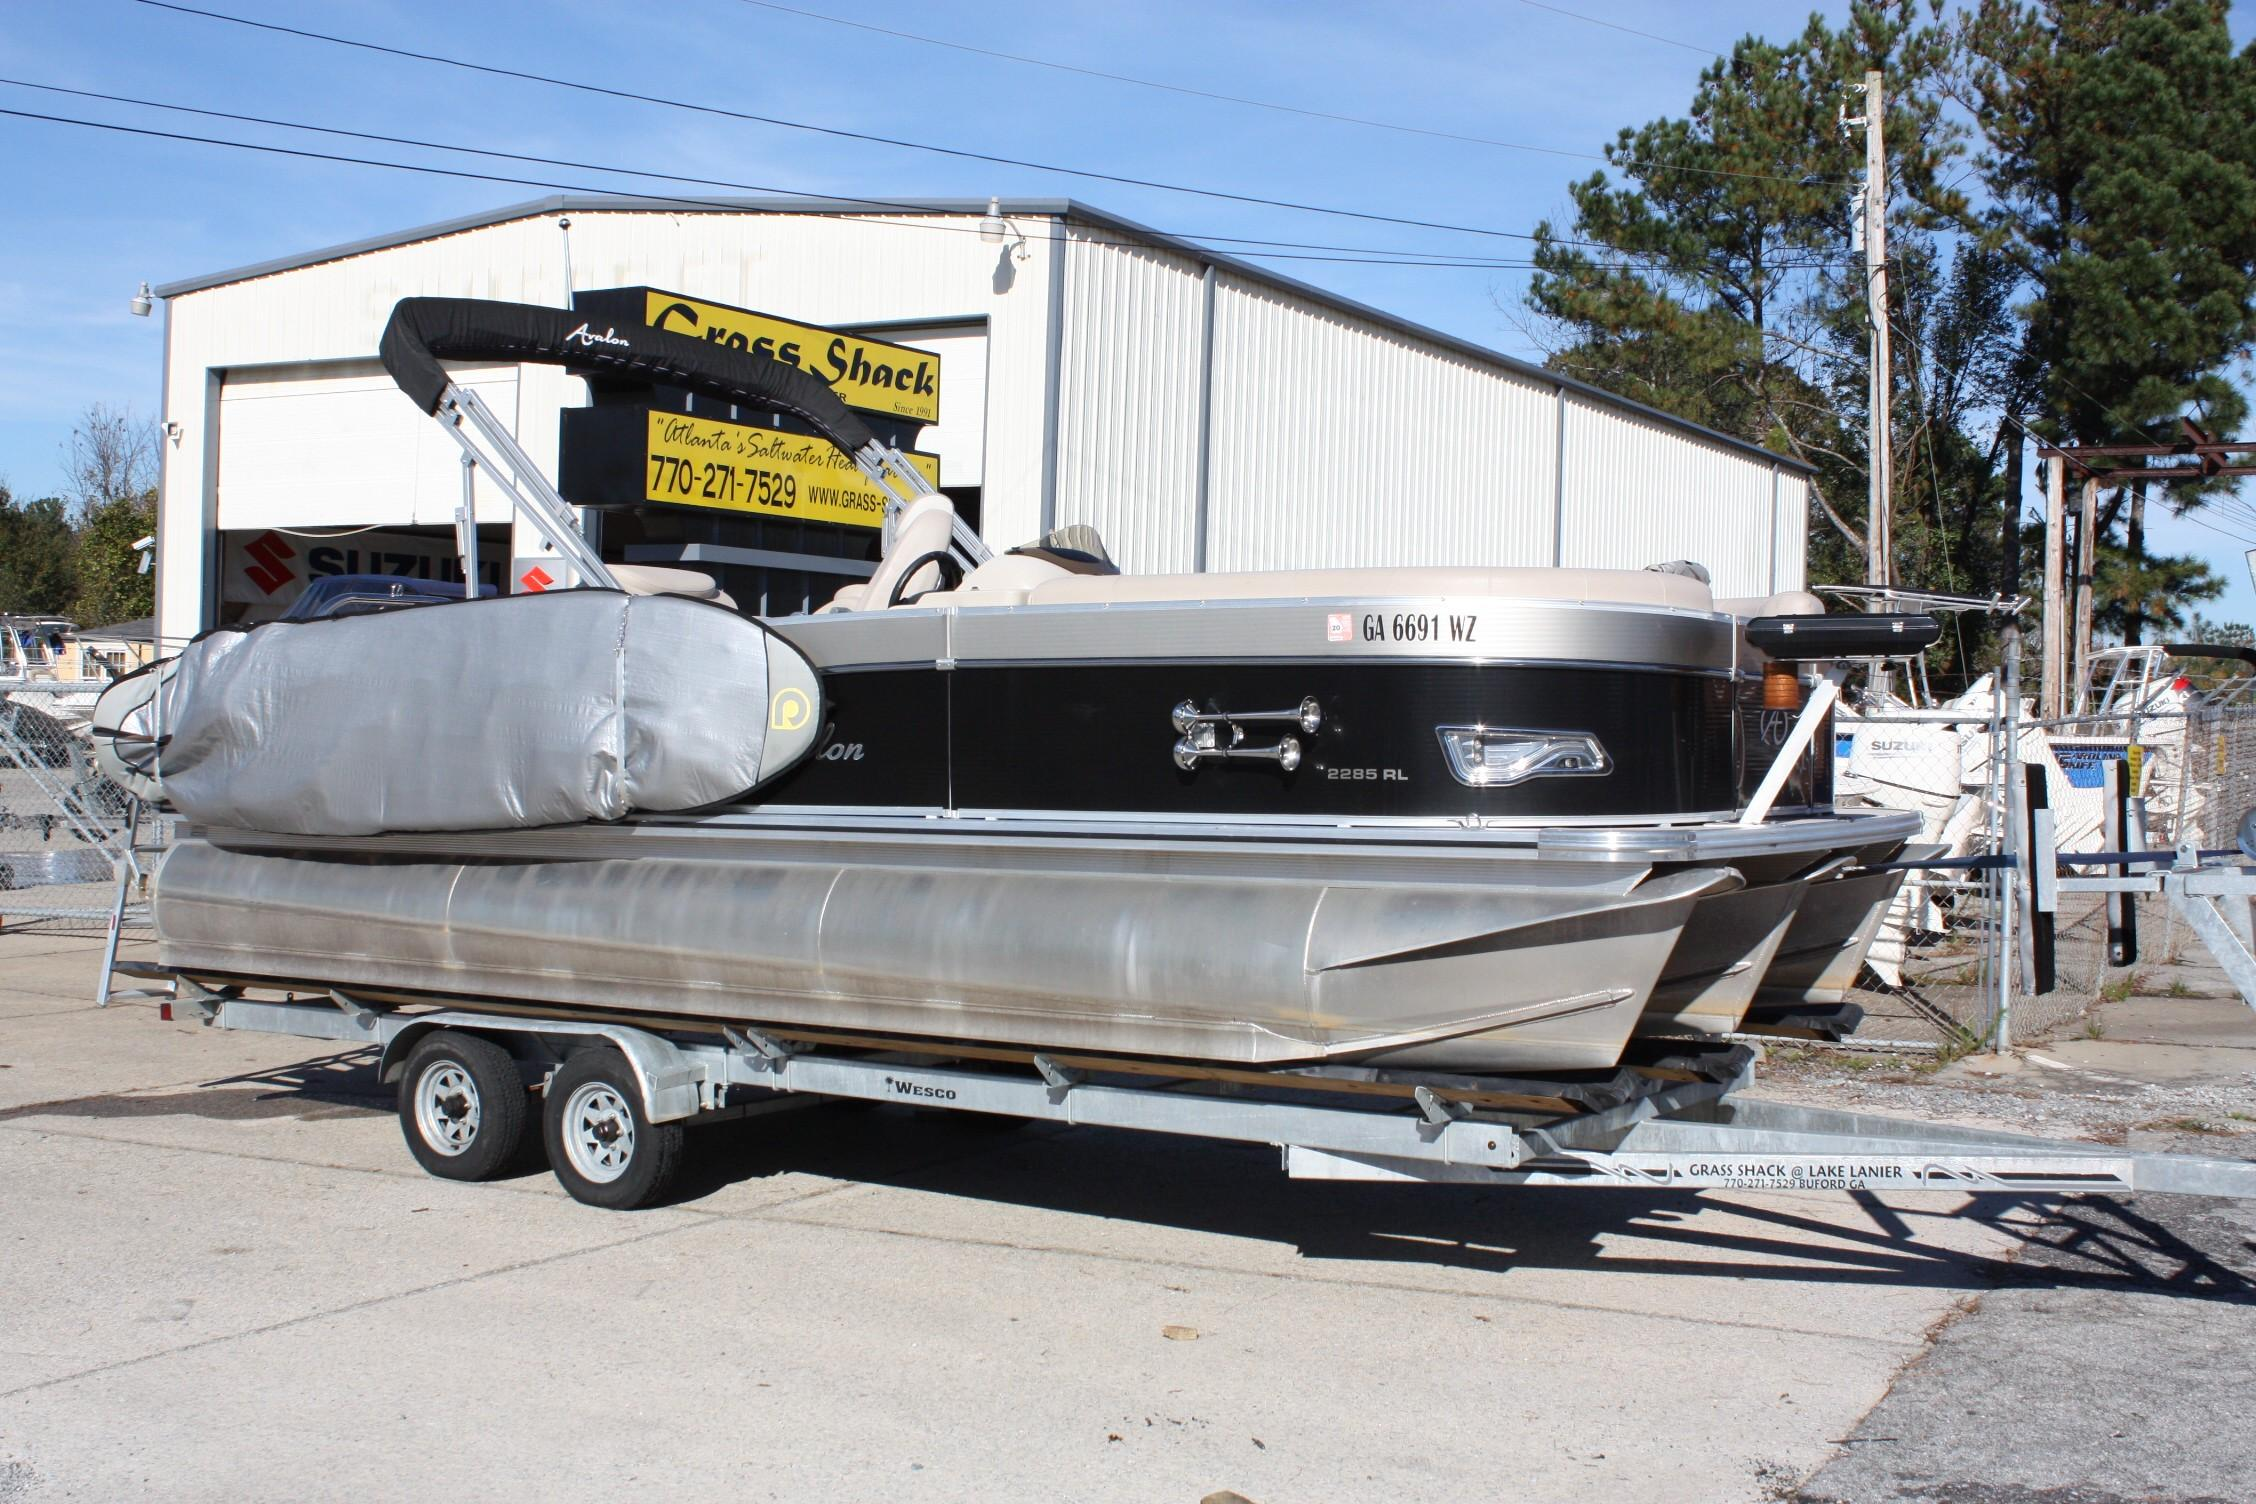 5725 2006 Pt 175 Tracker Boat Wiring Diagram Mobi Download